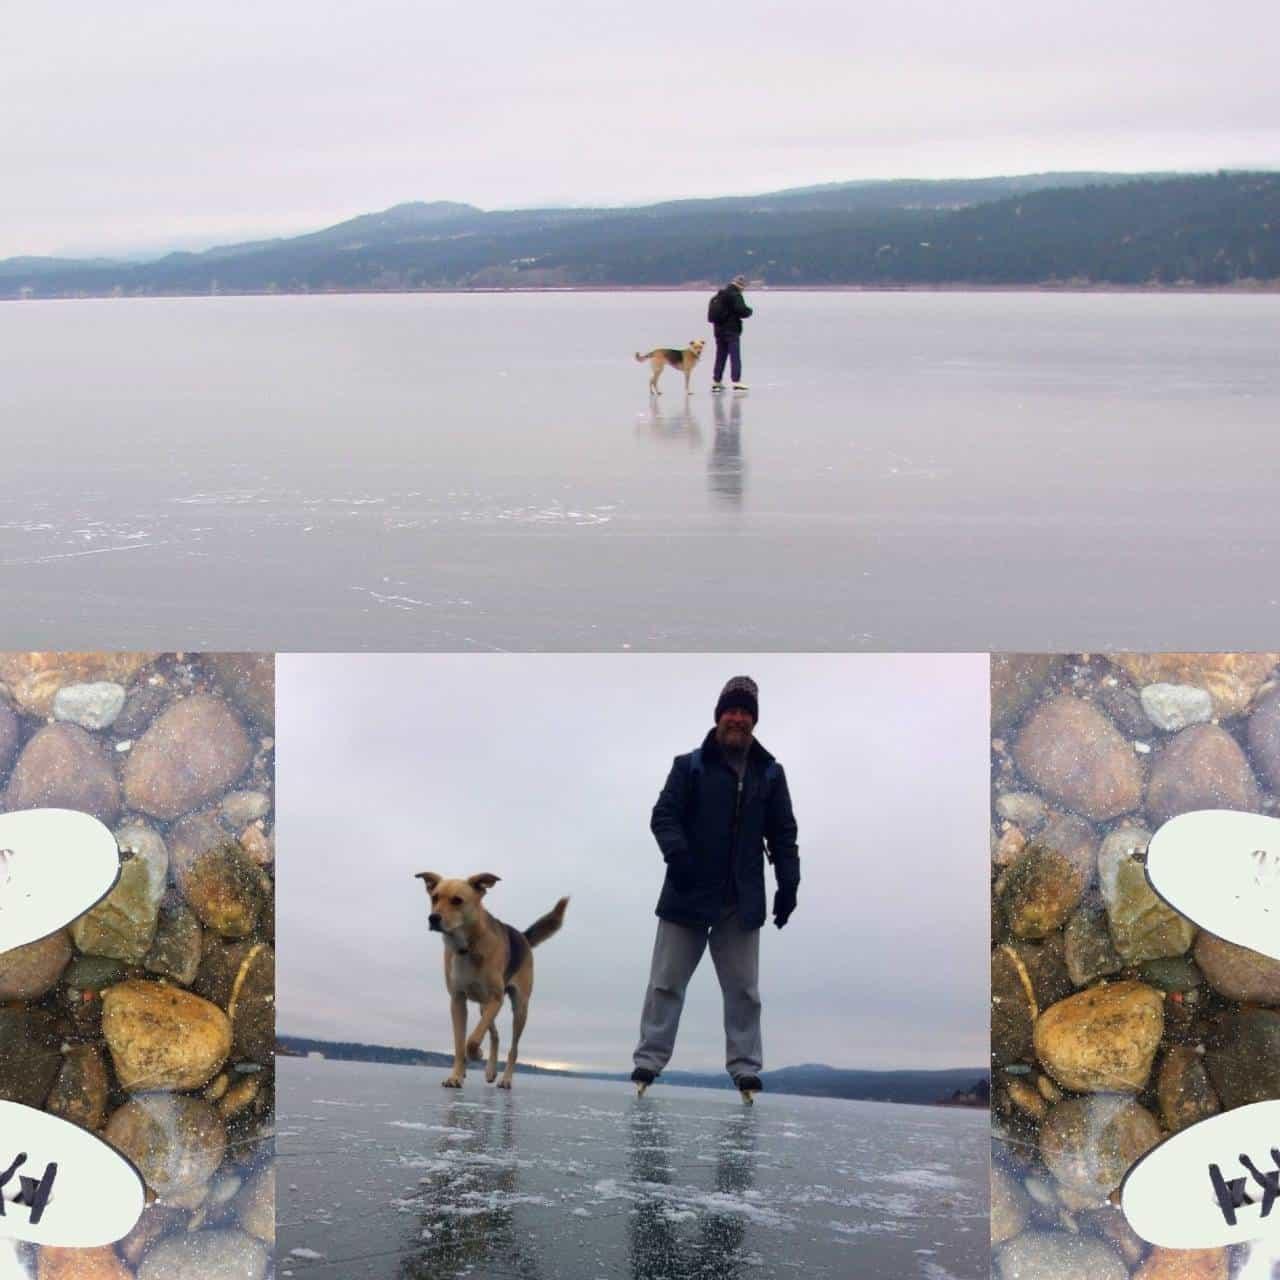 171212;skate-collage-insta